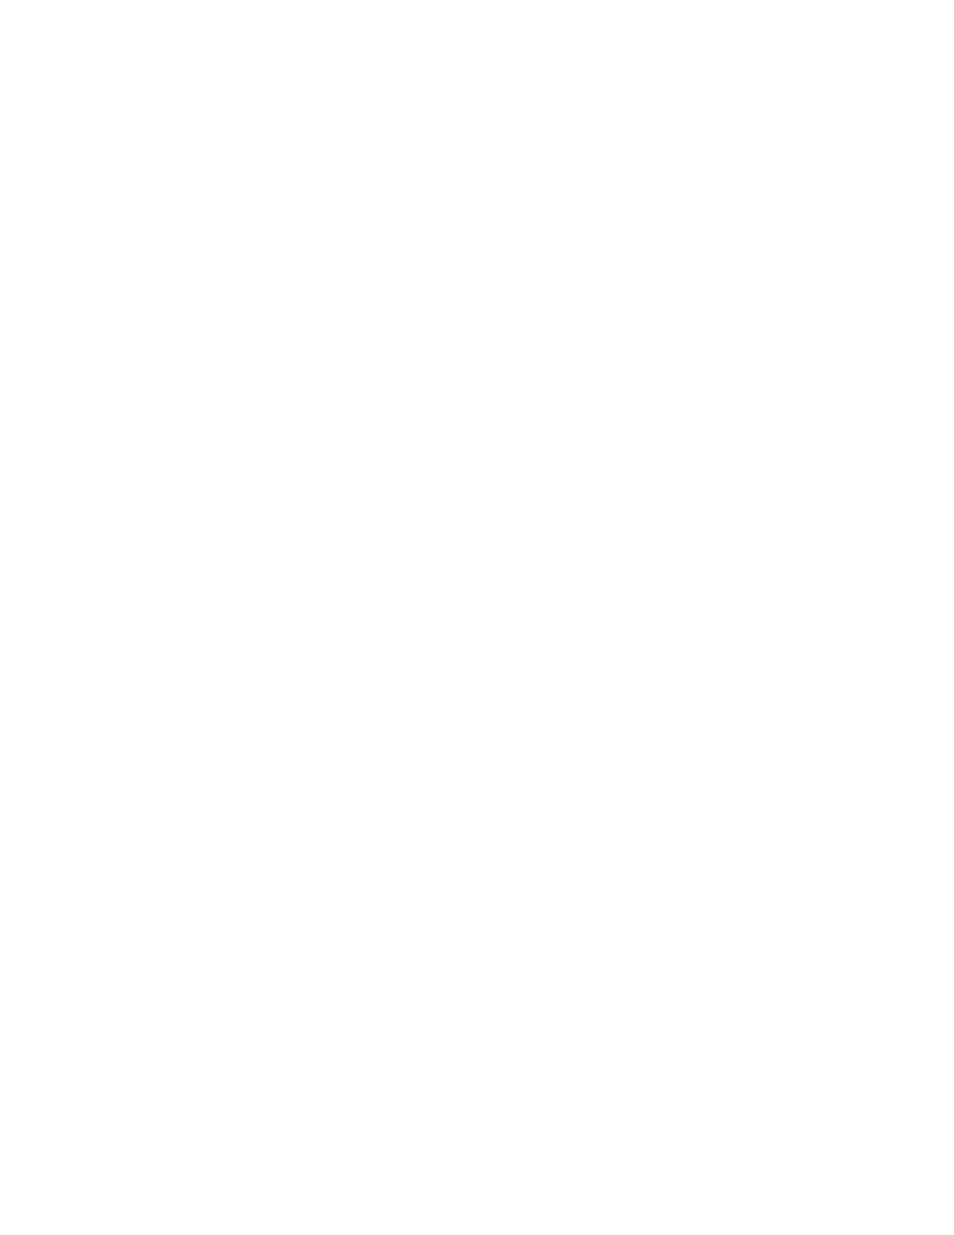 dell laser user manual daily instruction manual guides u2022 rh testingwordpress co Dell 3000Cn Dell 3000Cn